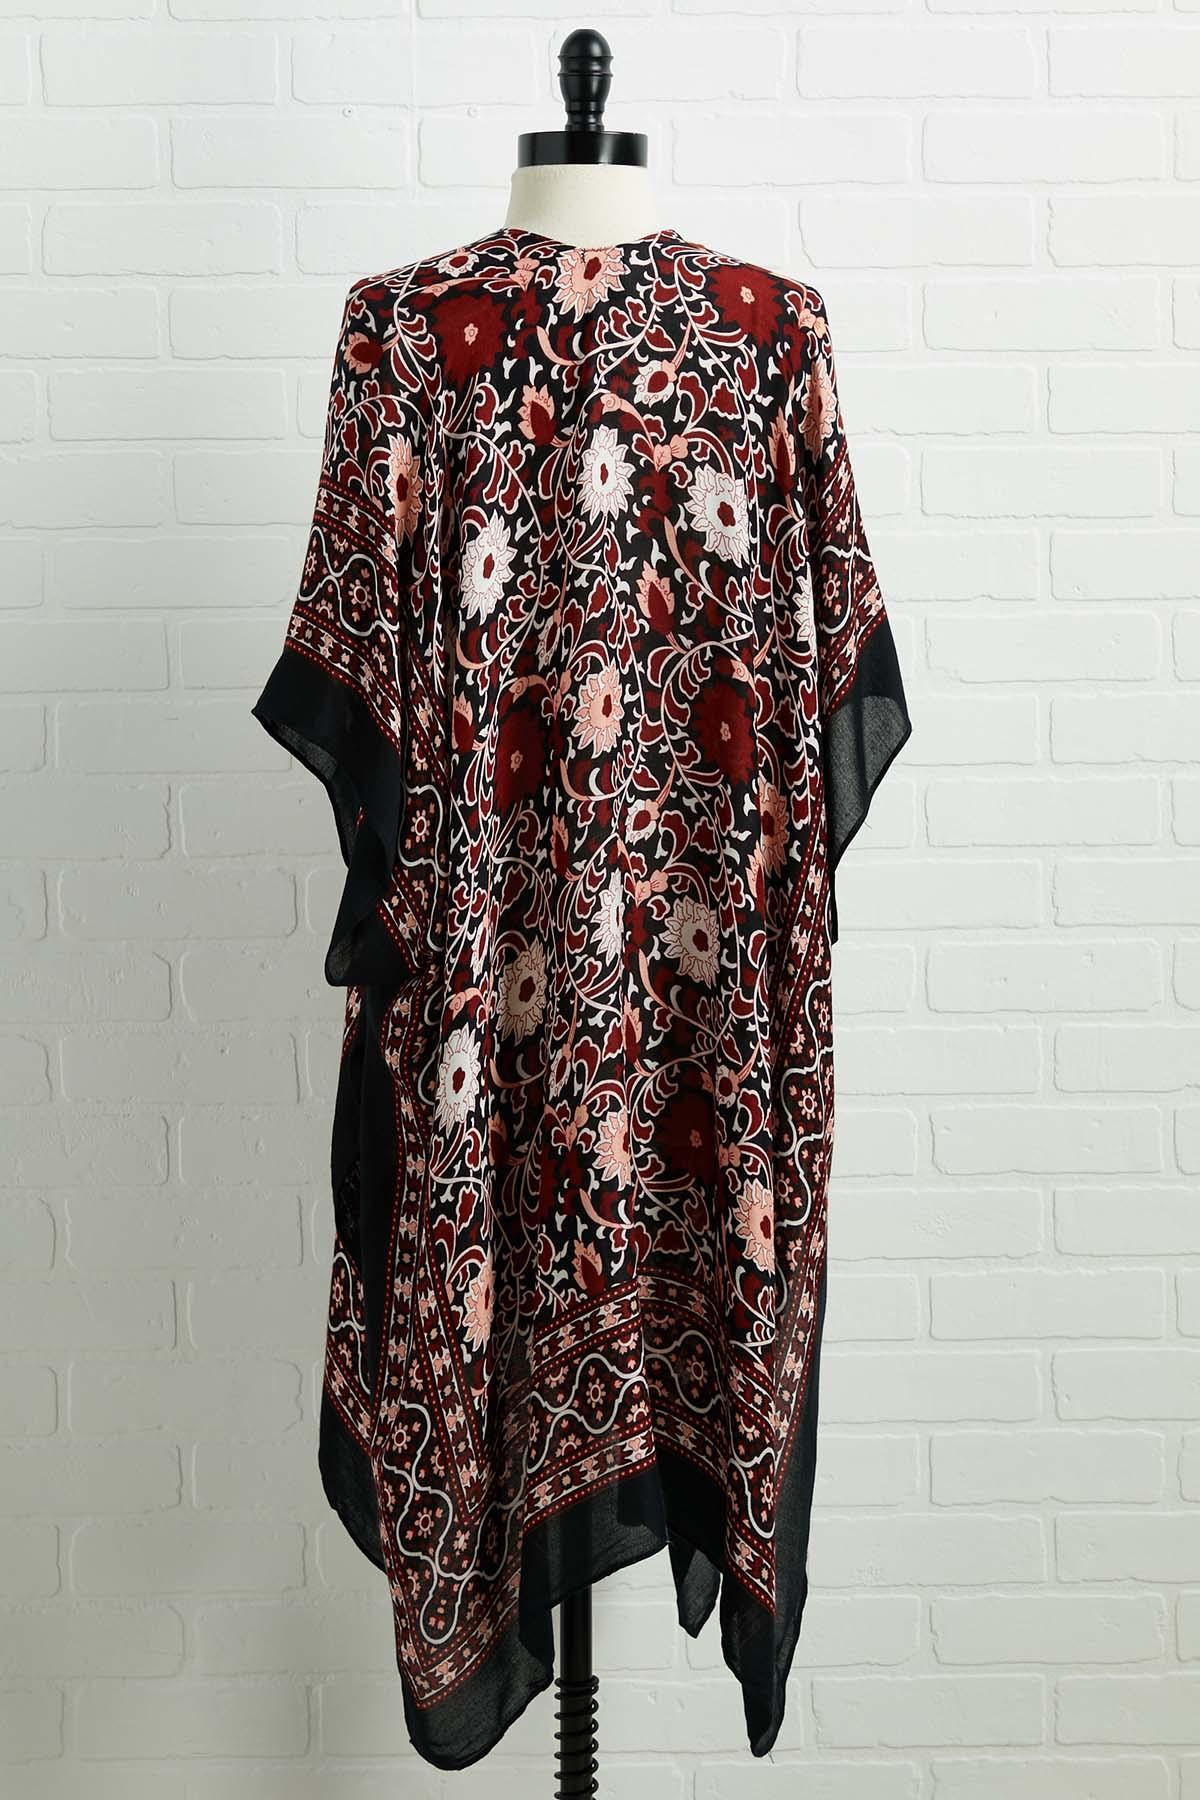 One More Glass Of Red Kimono